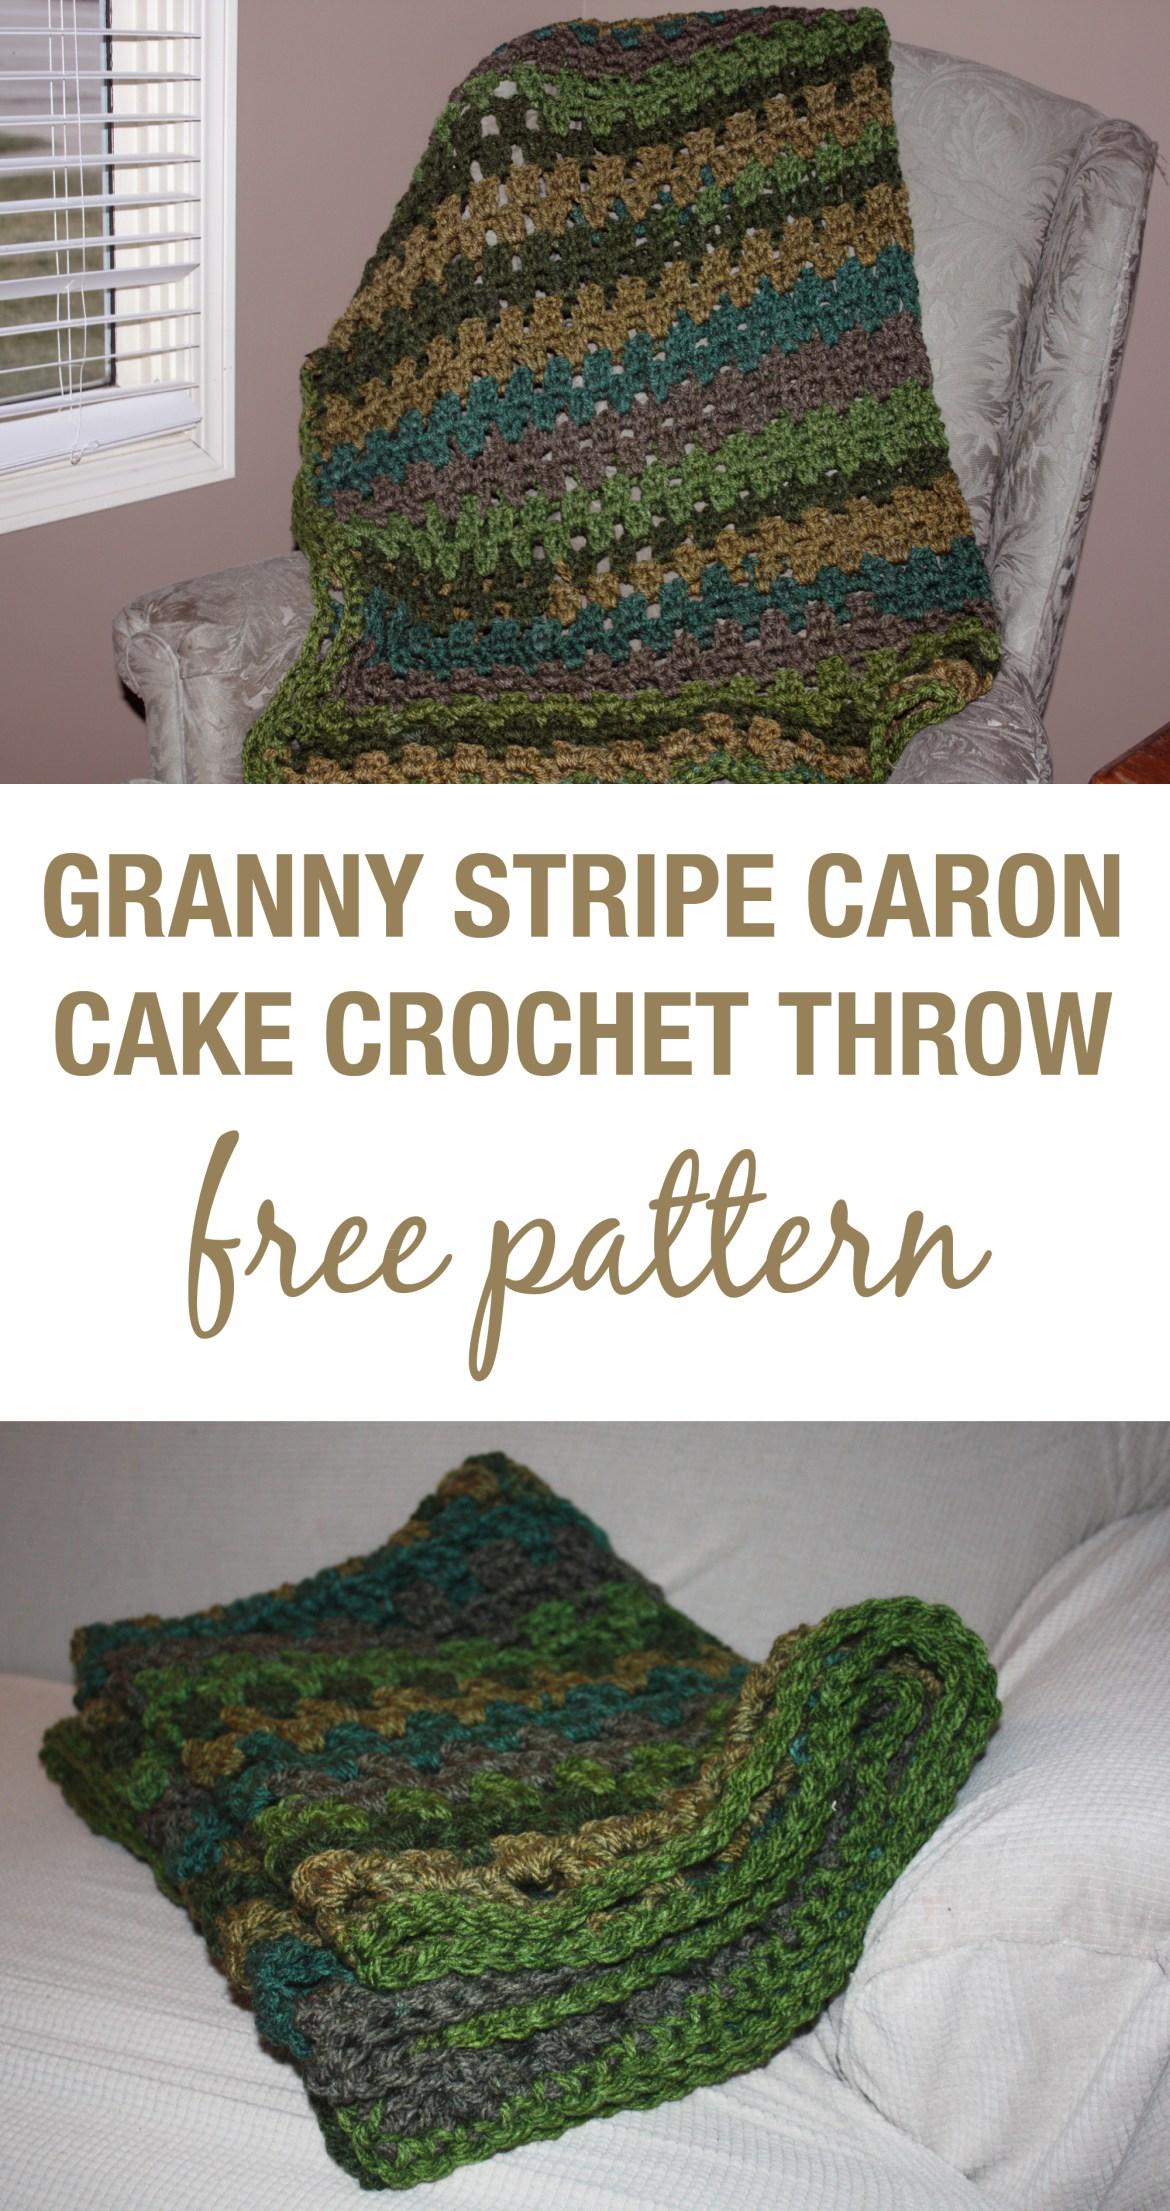 Granny Stripe (small) Crochet Throw with Caron Tea Cakes